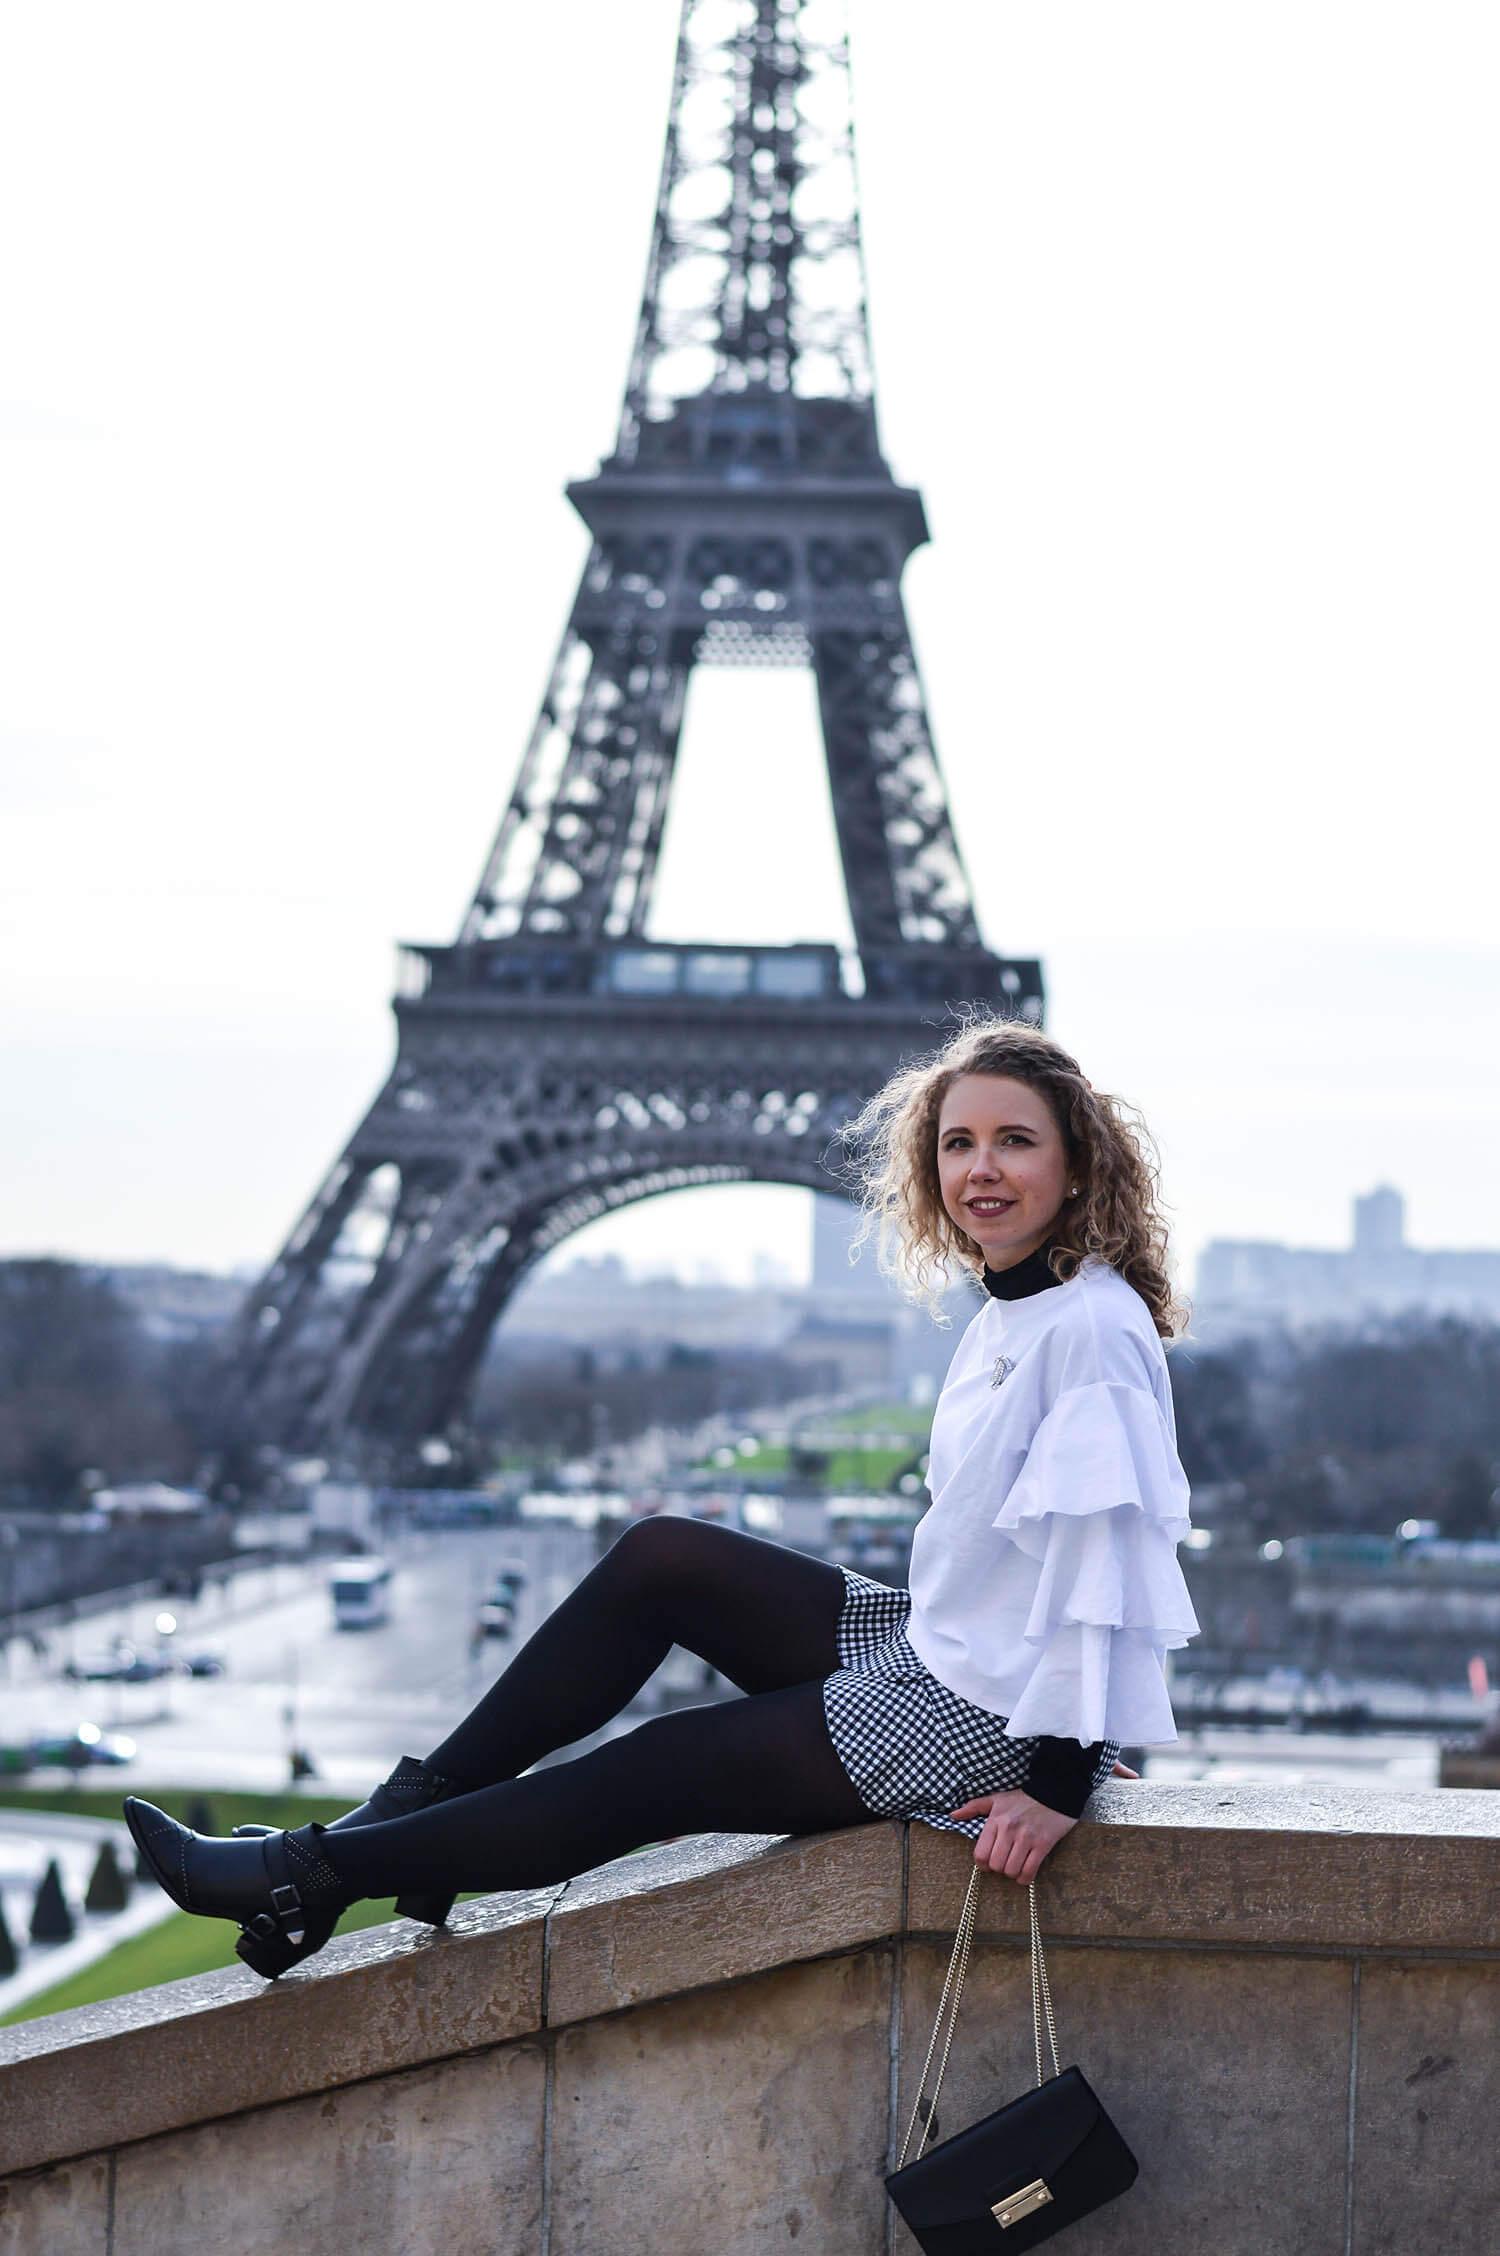 Kationette-Fashionblog-Kationette-Outfit-Volants-Vichy-Check-Chanel-EiffelTower-Paris